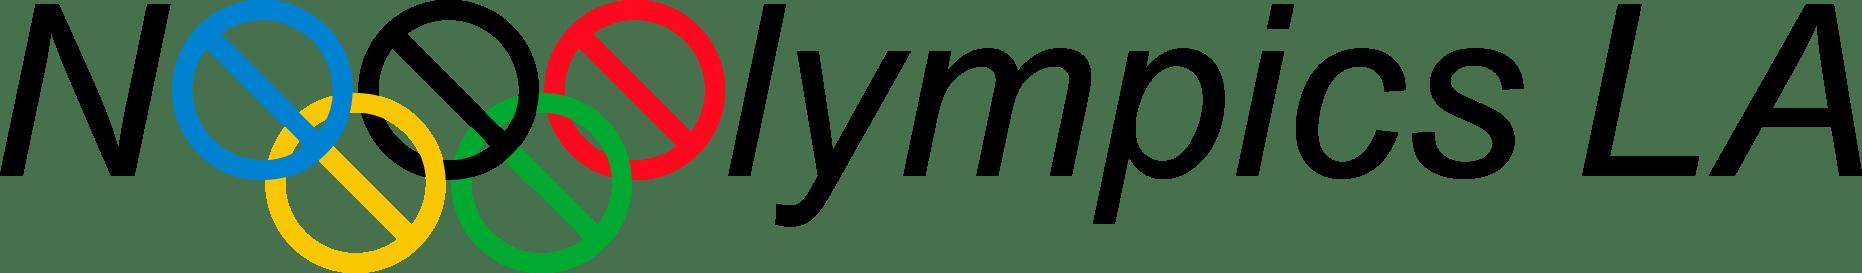 Analysis Nolympics La